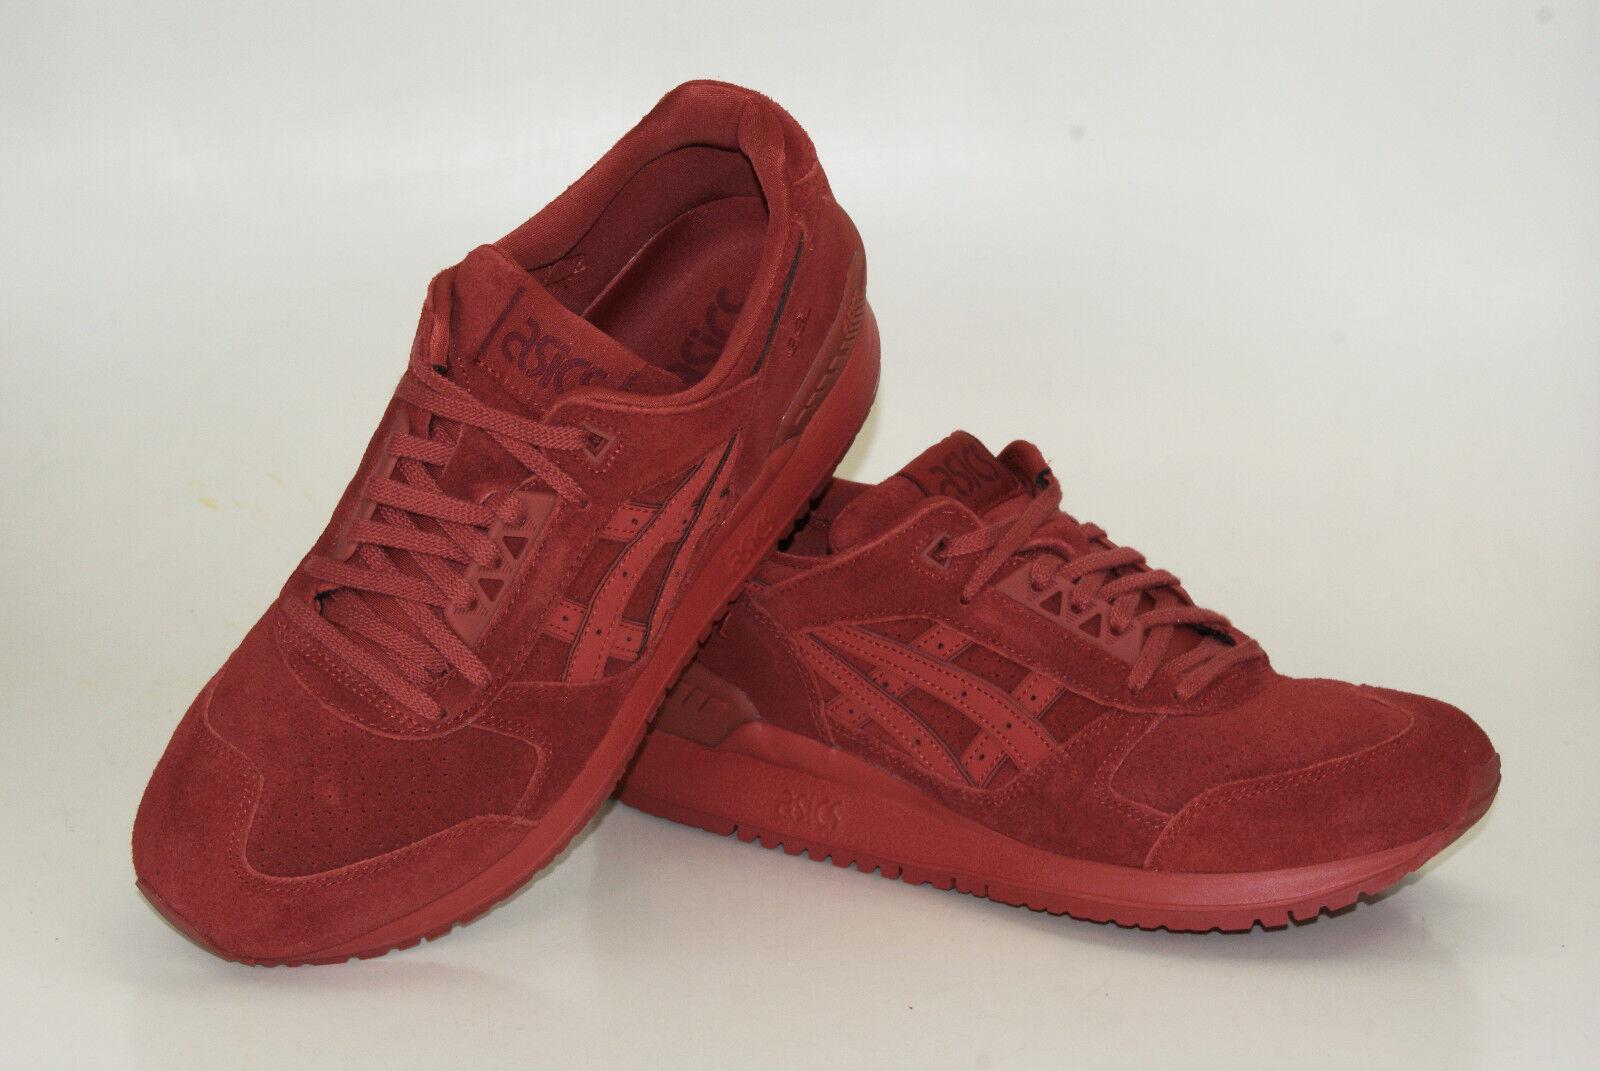 Asics Gel-Respector Sneakers Leisure Men's shoes Retro Trainers H721l-2727